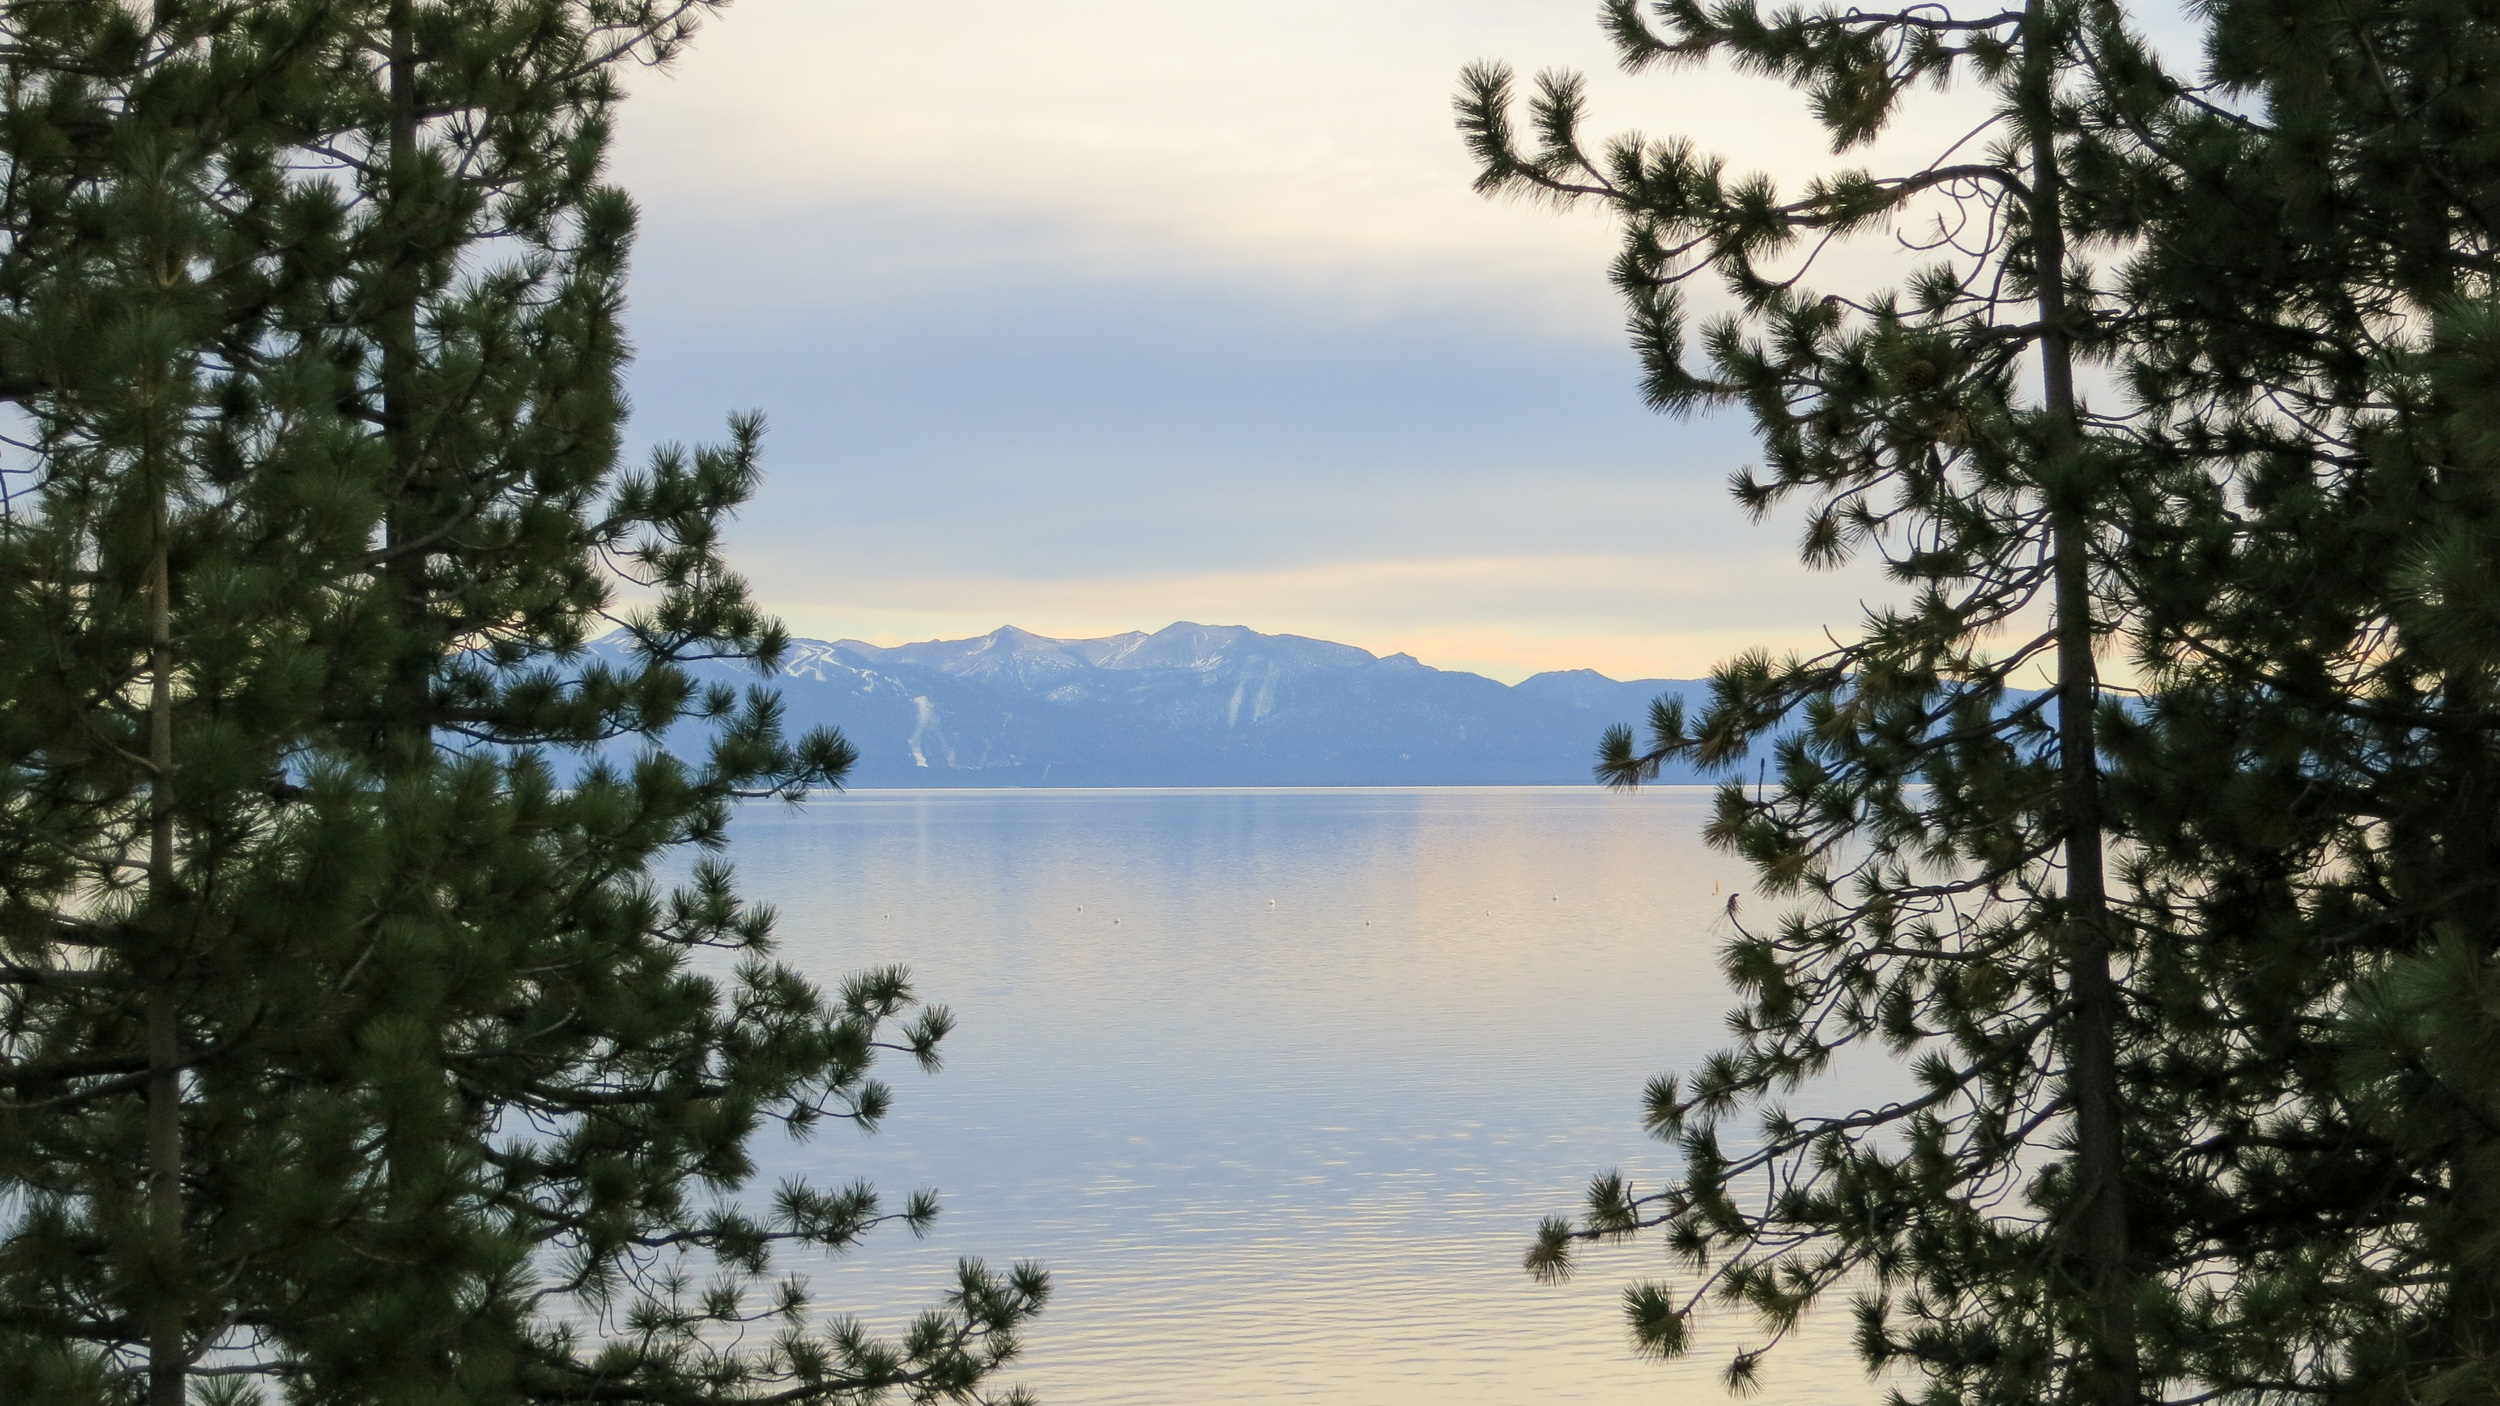 LakeTahoe-1.jpg